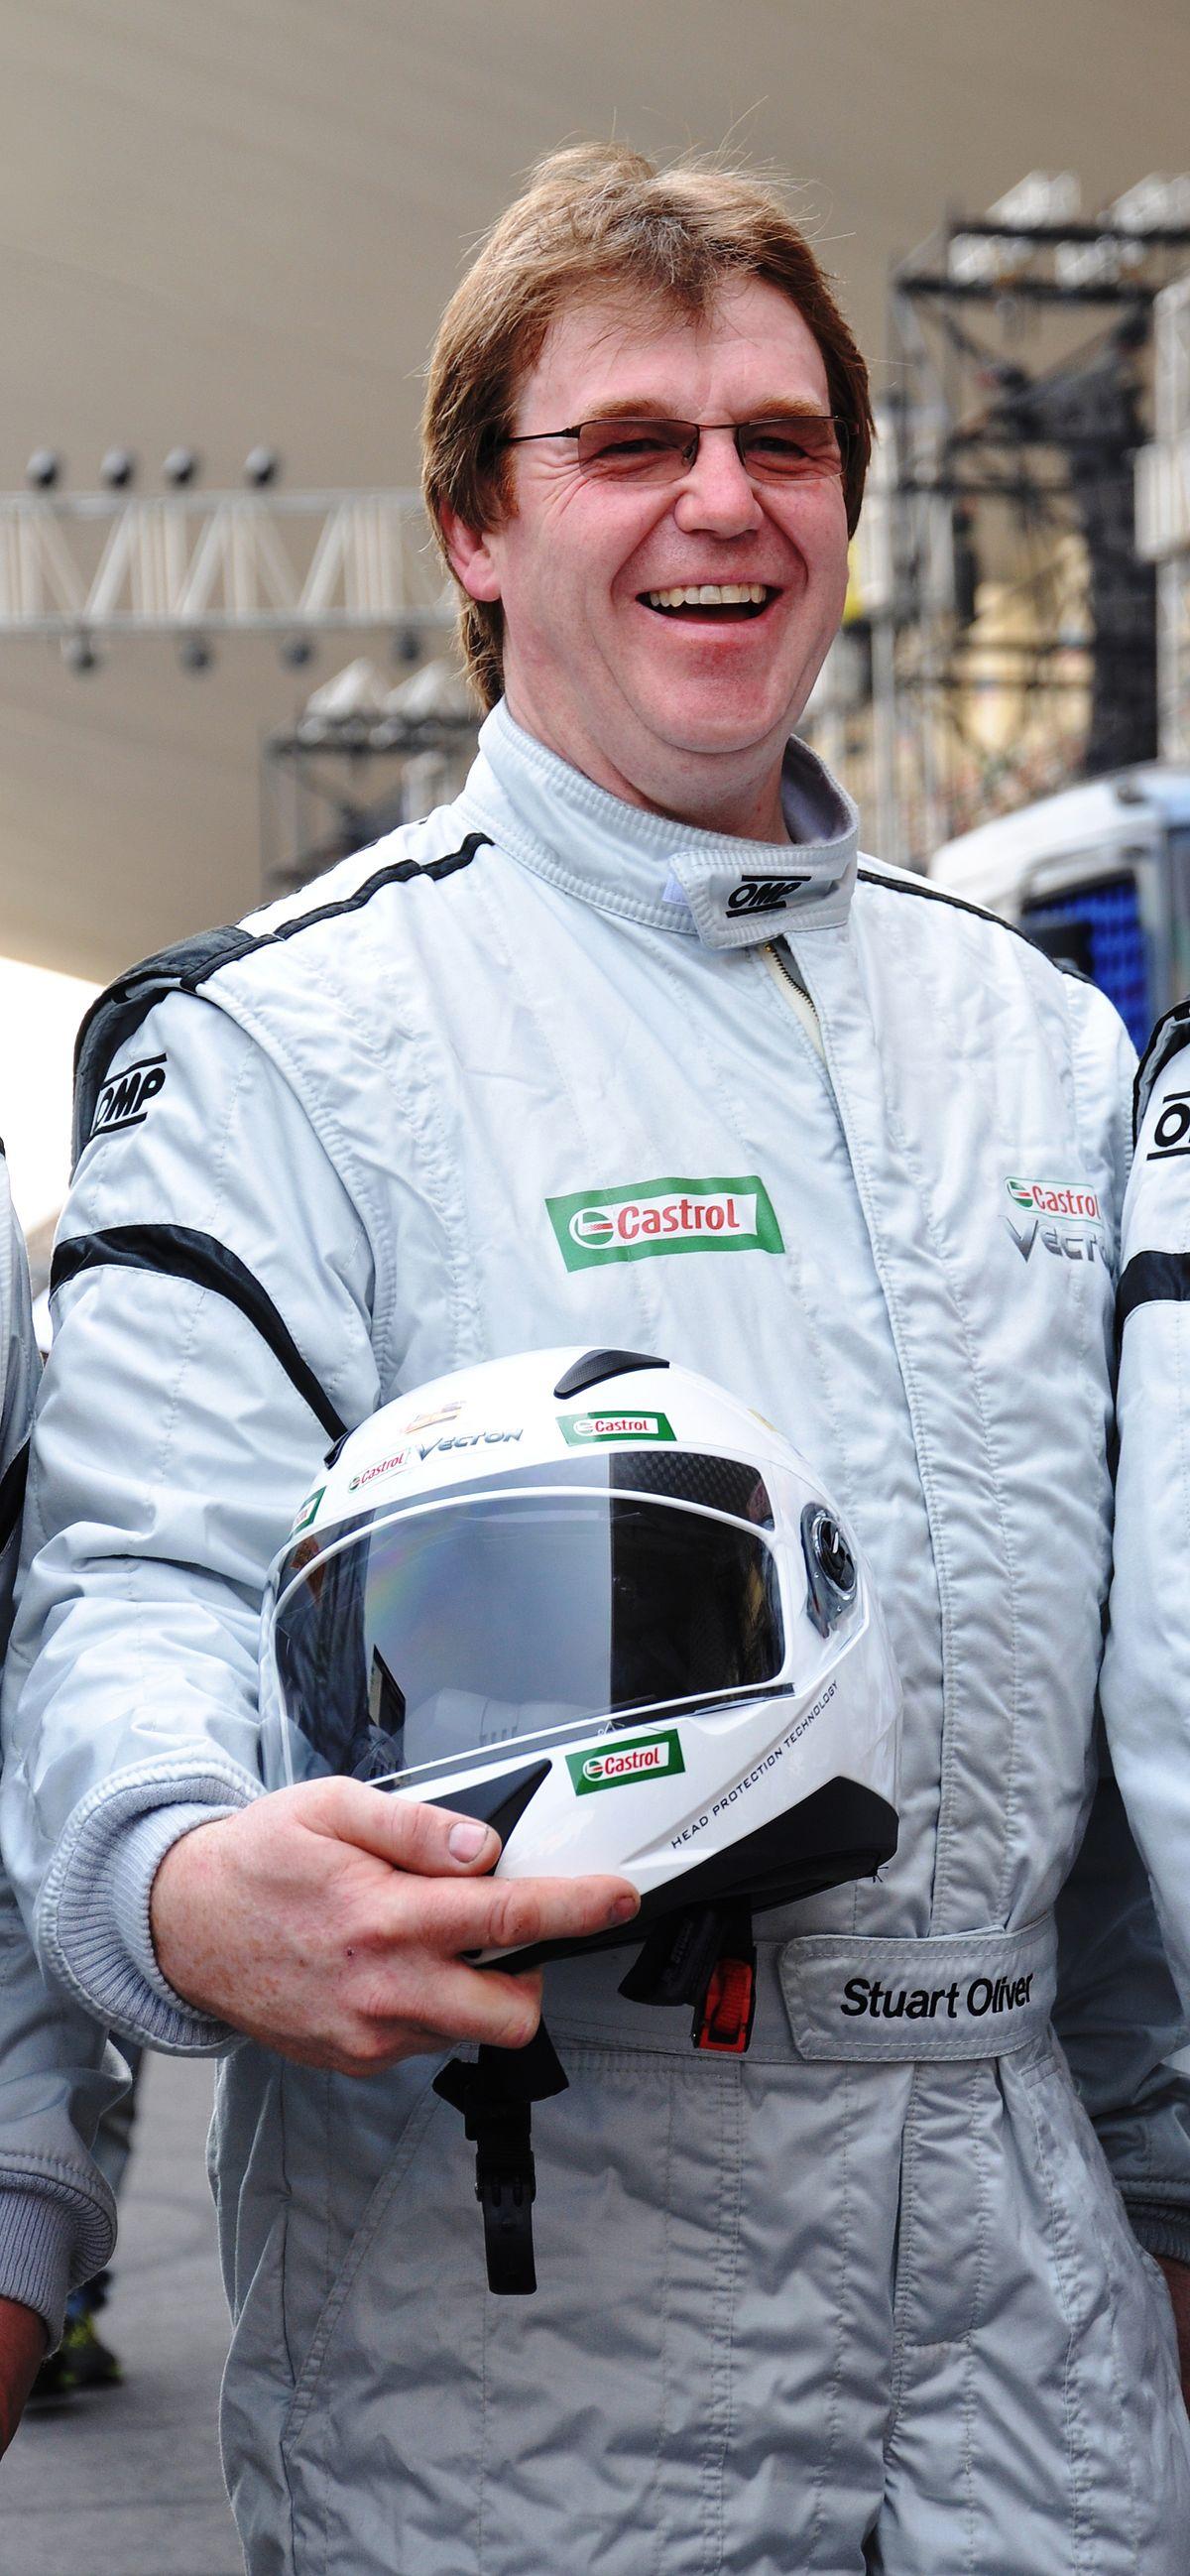 Stuart Oliver (racing driver) - Wikipedia